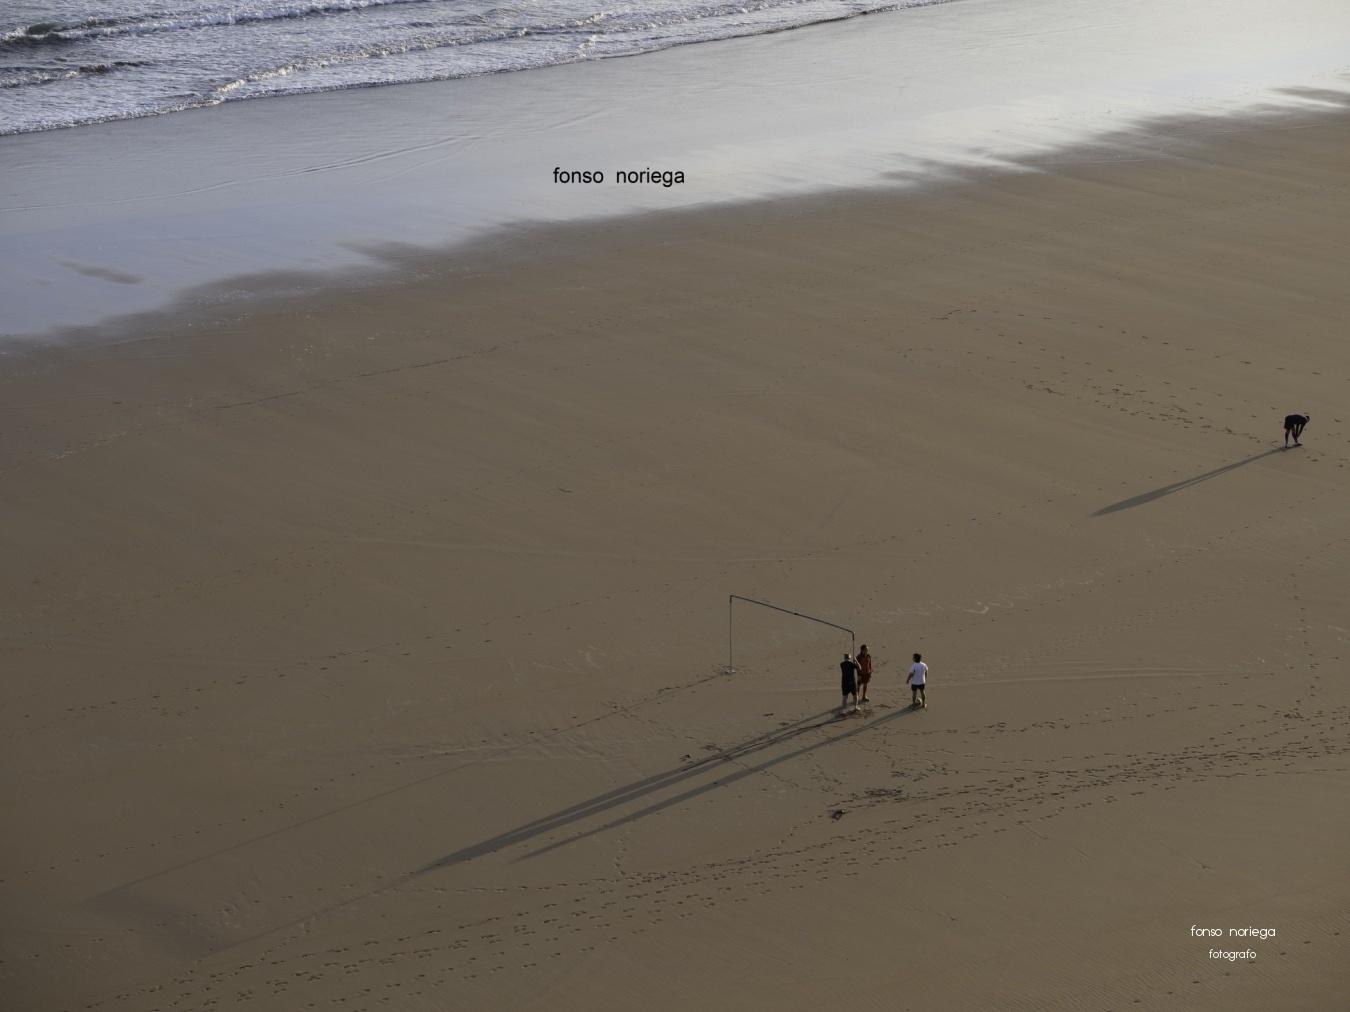 playa para todo - color - fonso noriega, fotógrafo